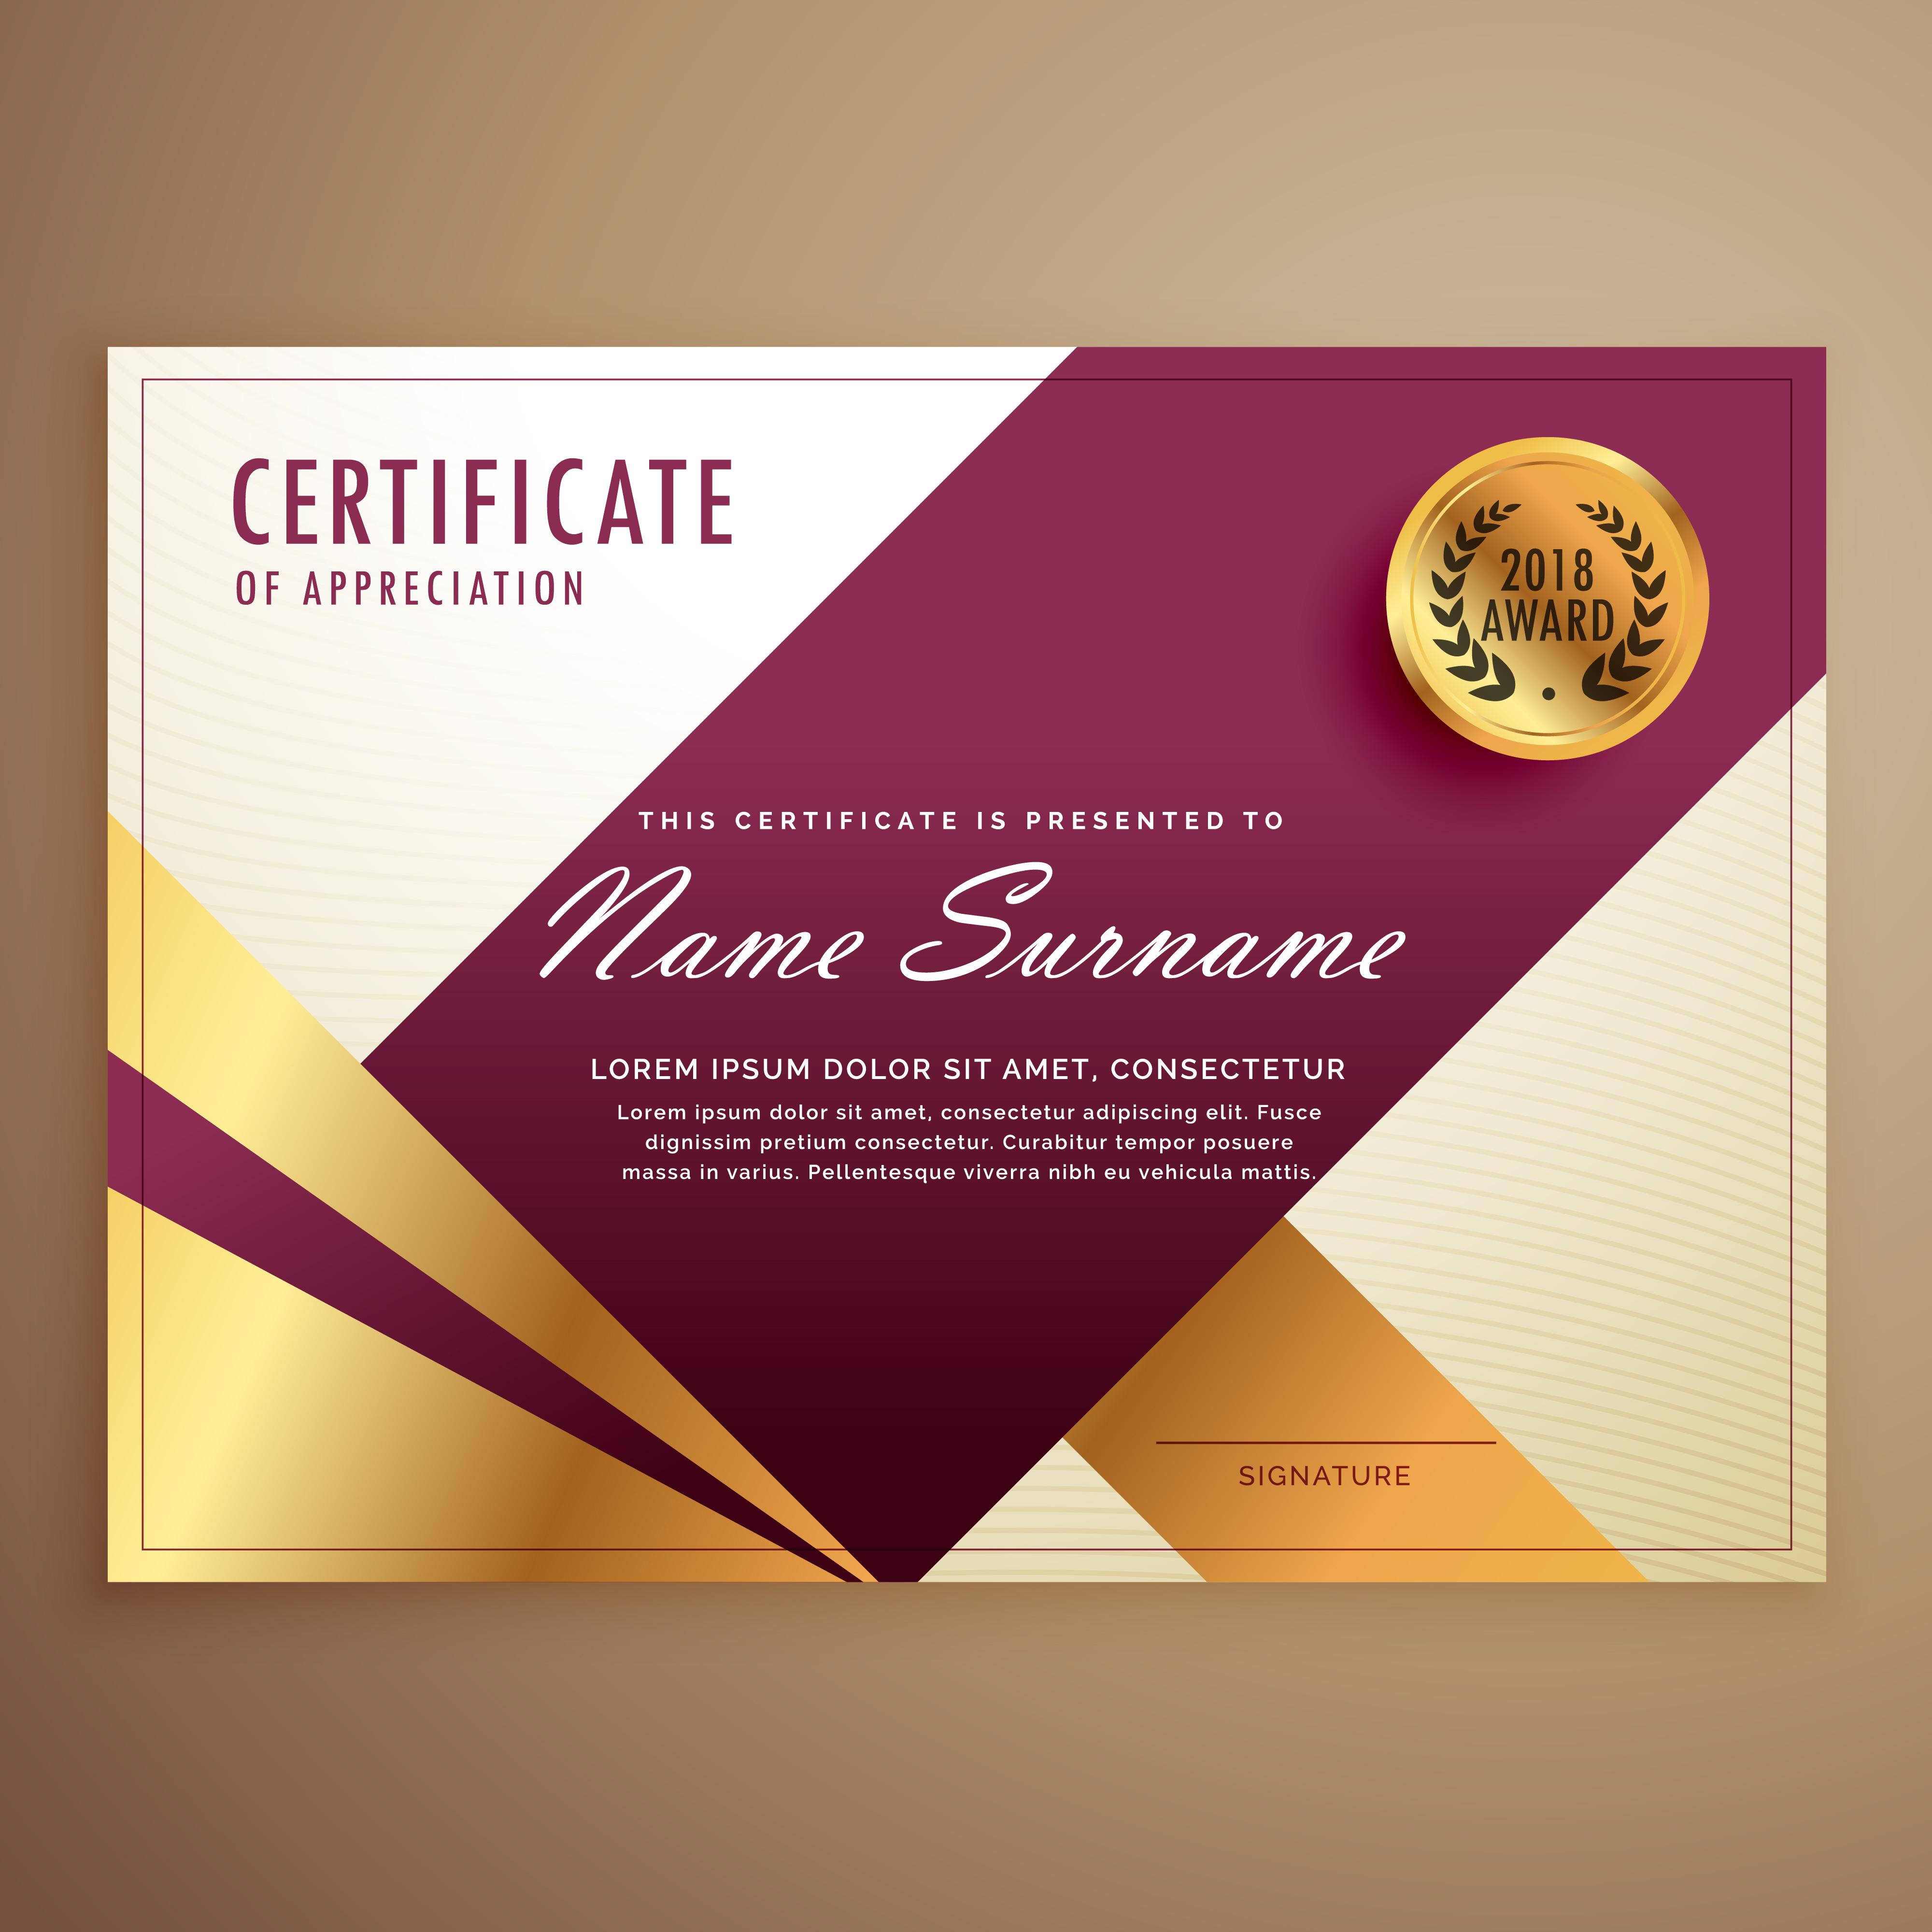 Premium Certificate Design Template With Modern Geometric